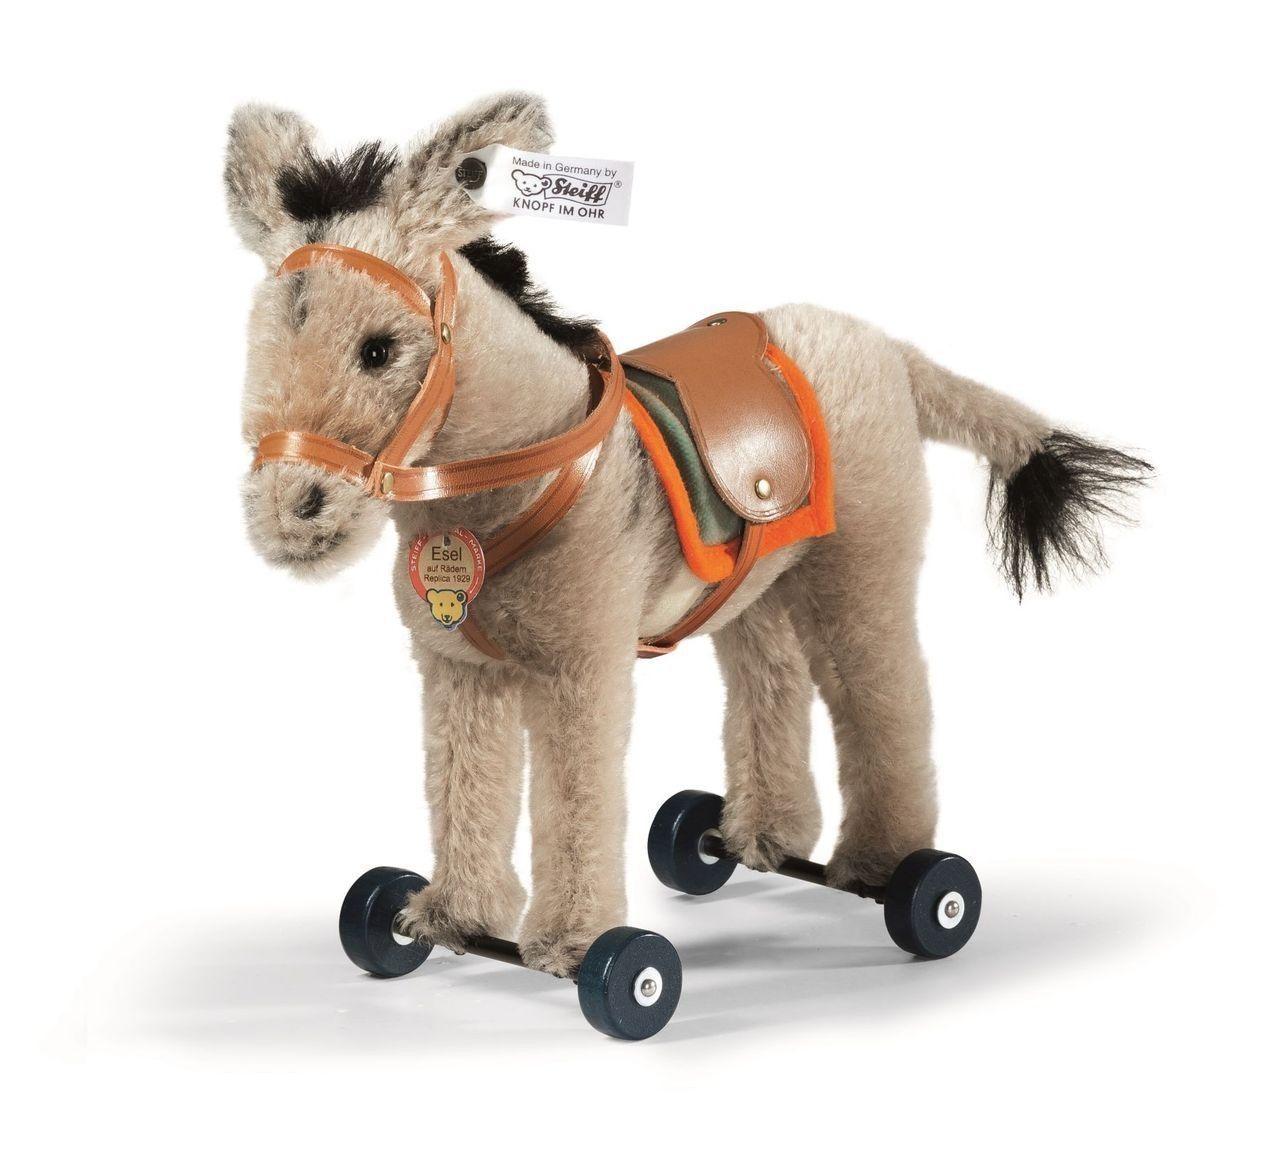 Steiff Donkey on Wheels Replica 1929 EAN 403194 Teddy